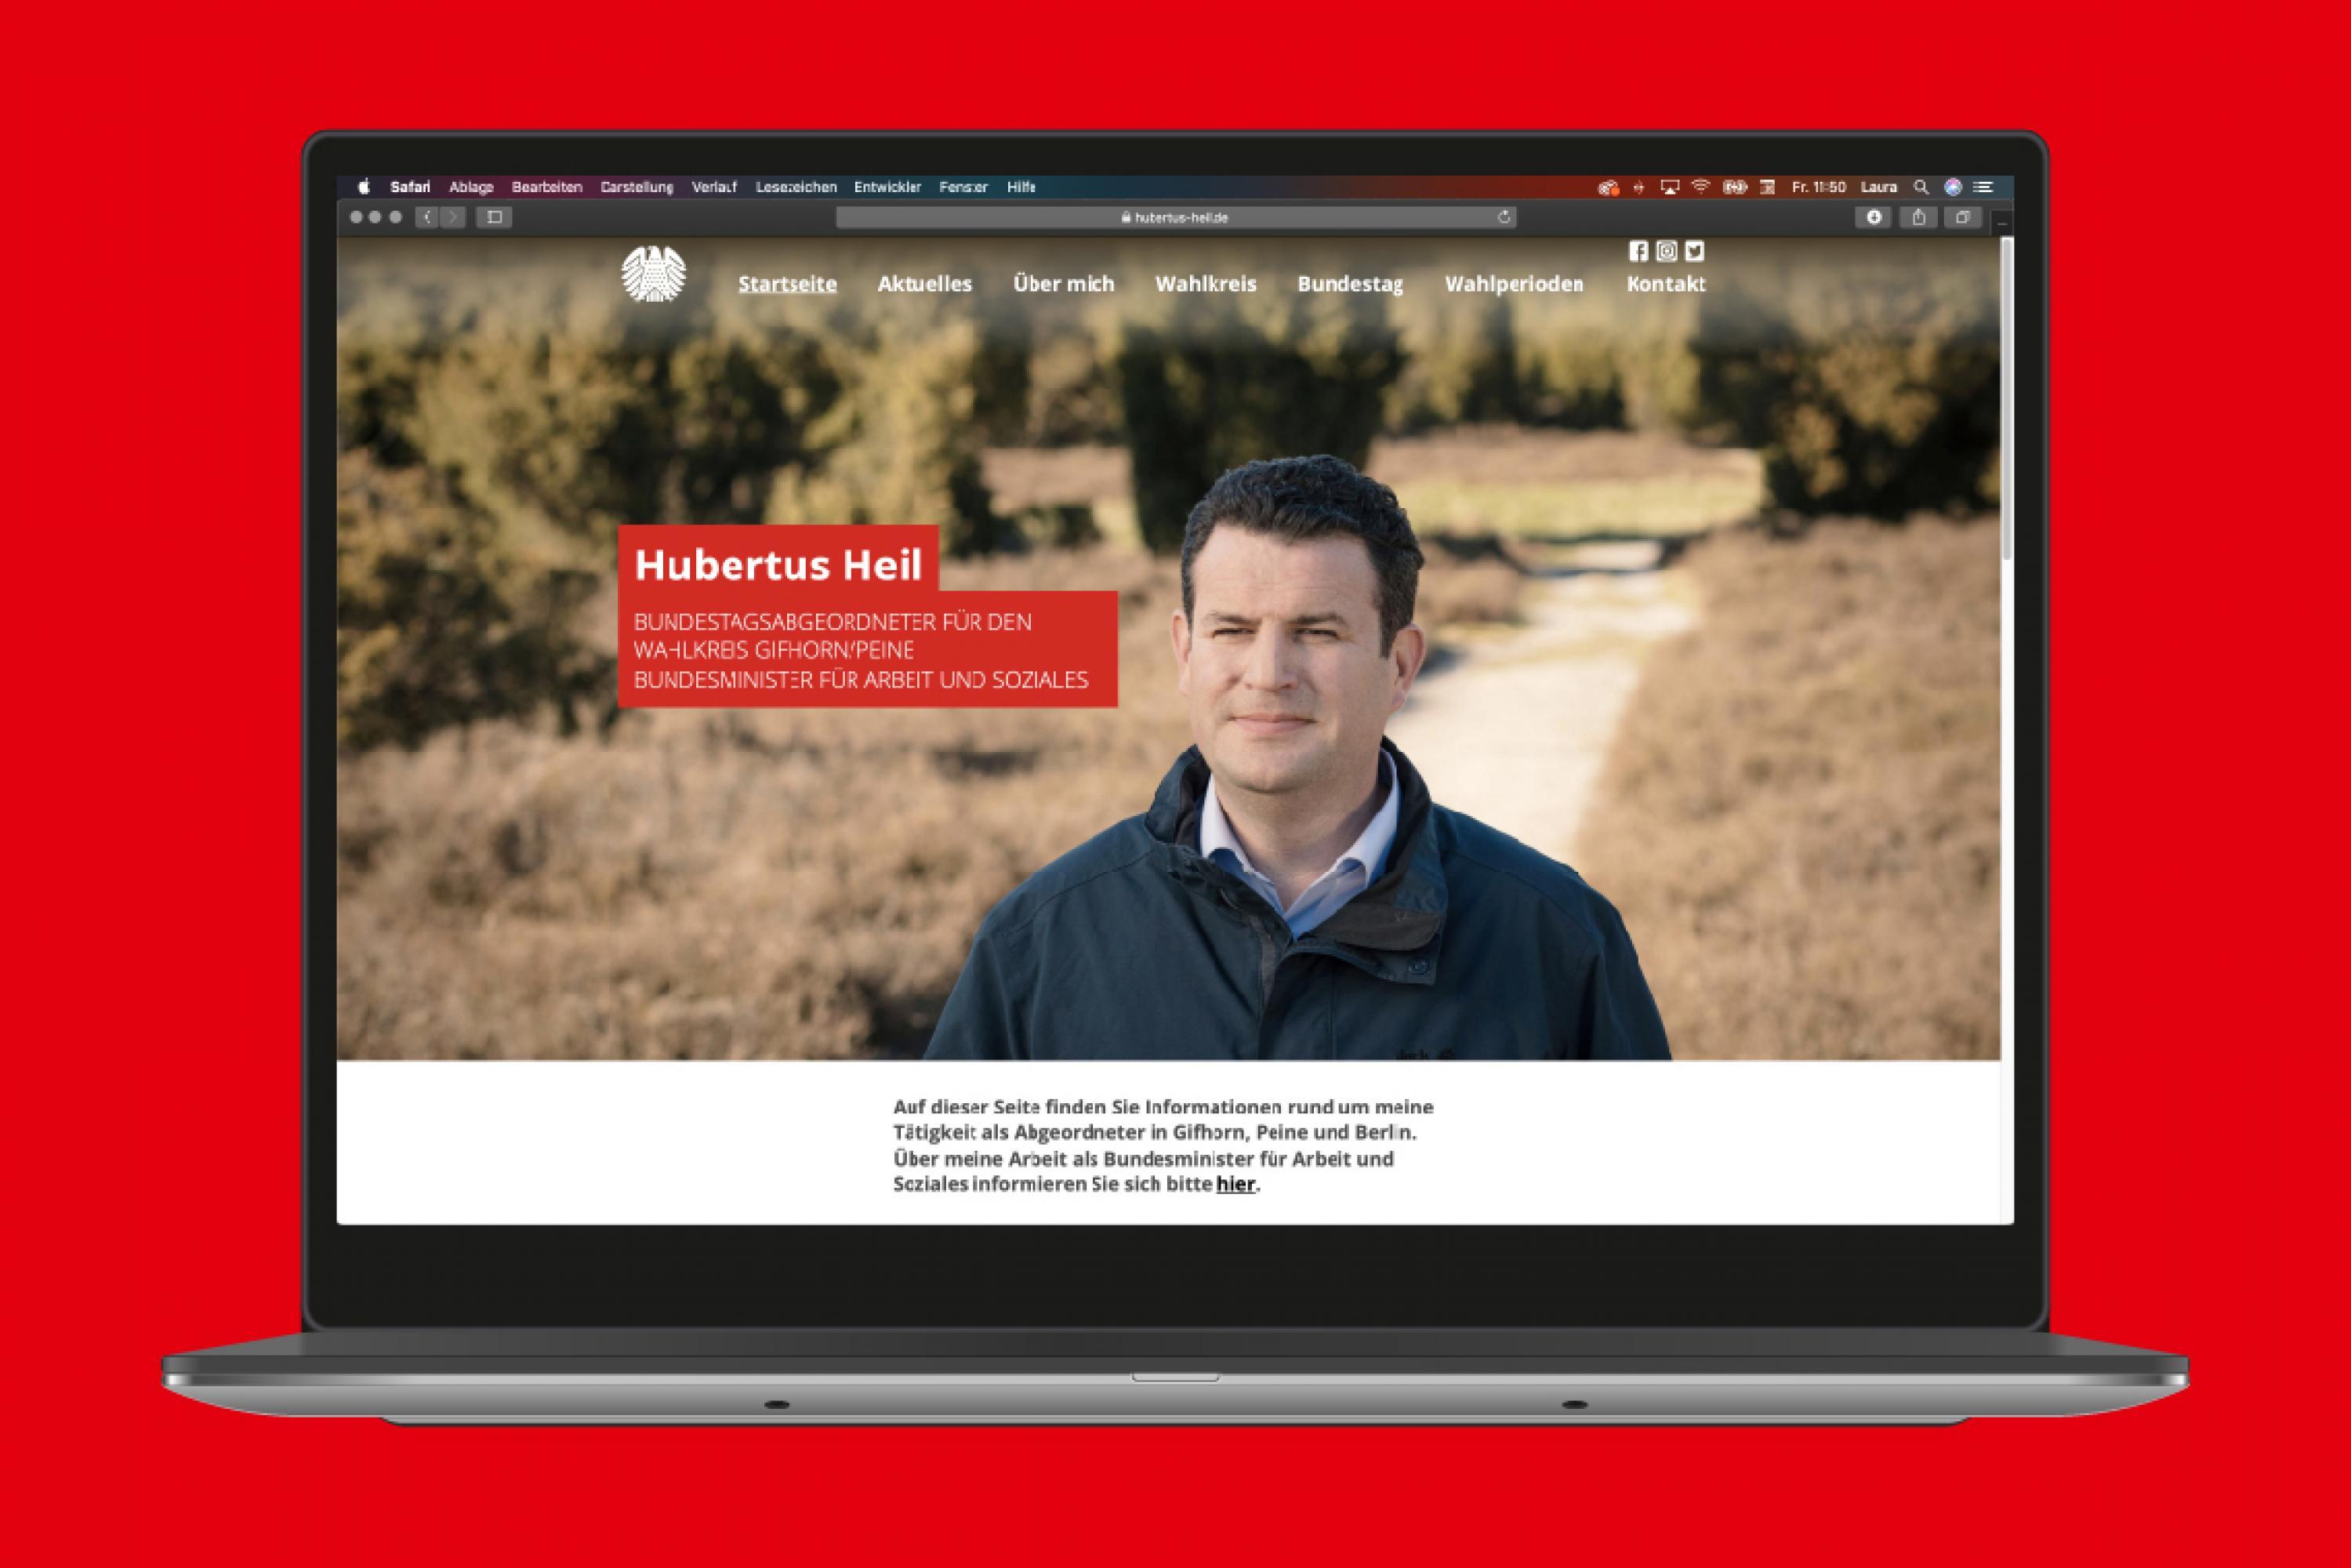 Website-Design-Webdesign-Hubertus-Heil-FORMLOS-Berlin-6 Kopie